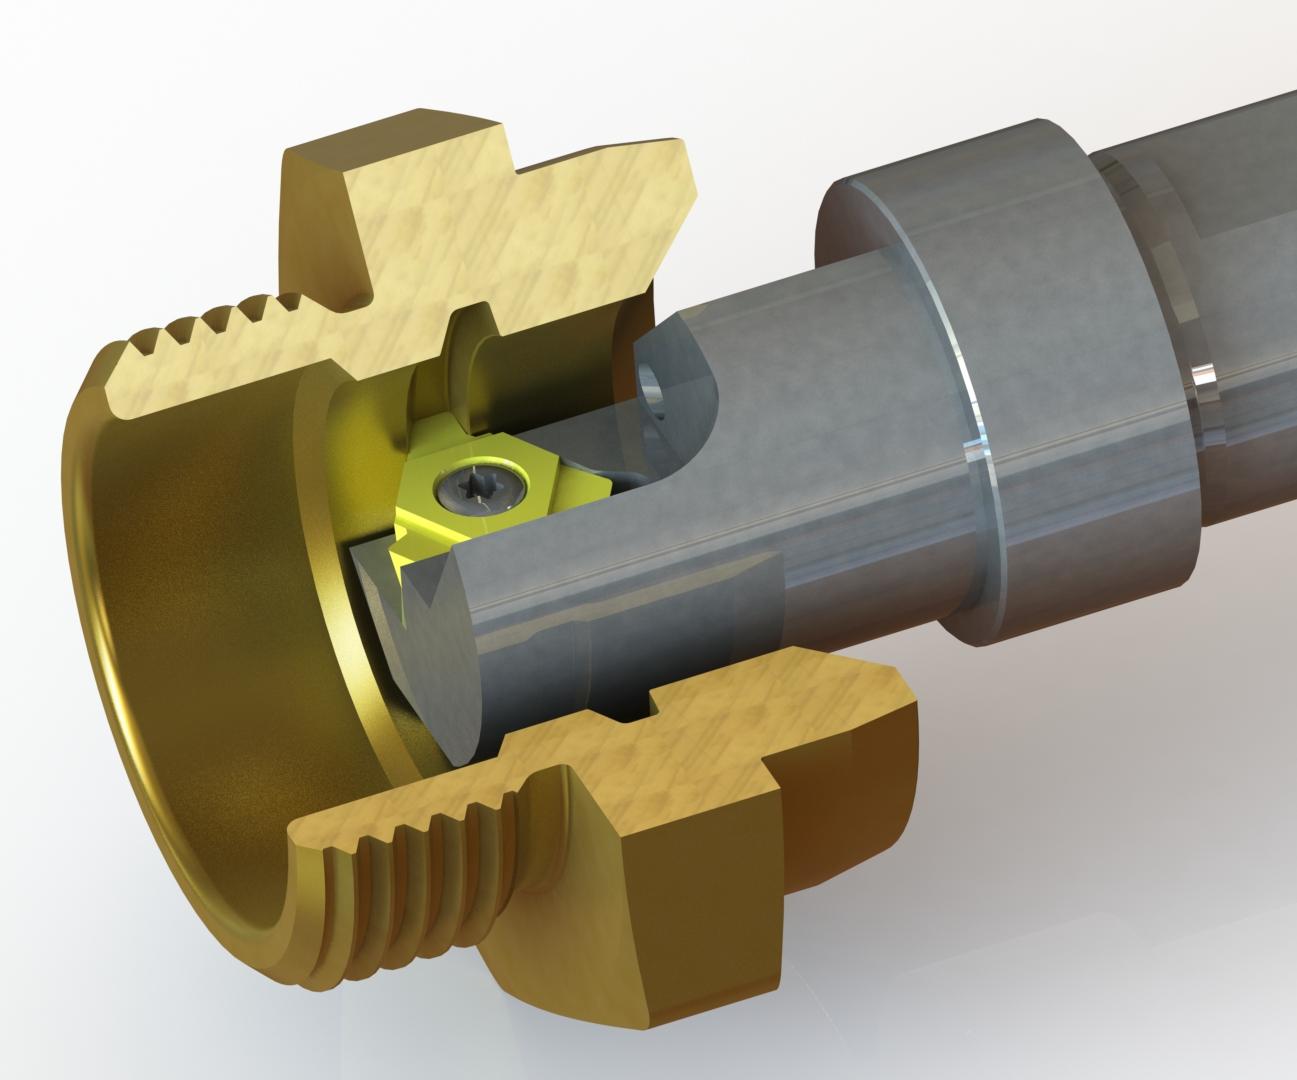 Sistema de herramientas de corte WEP, de Schwanog.